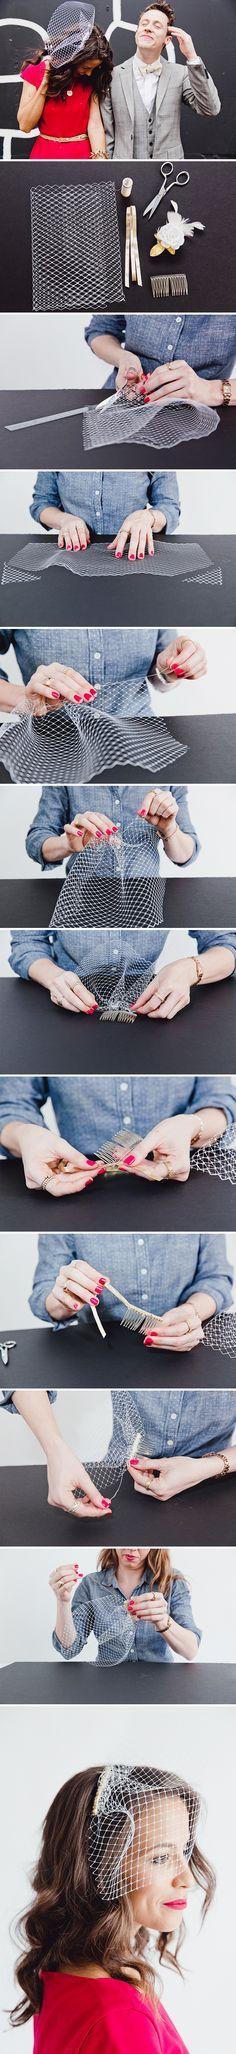 How to Make a $10 Birdcage Wedding Veil